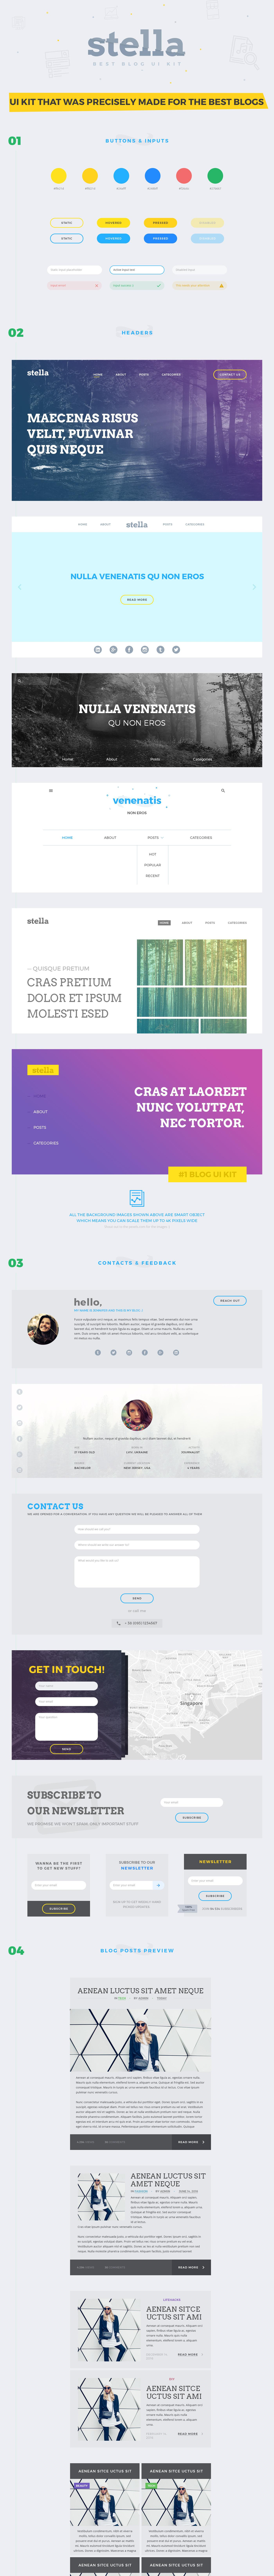 Stella — UI Kit [PSD]